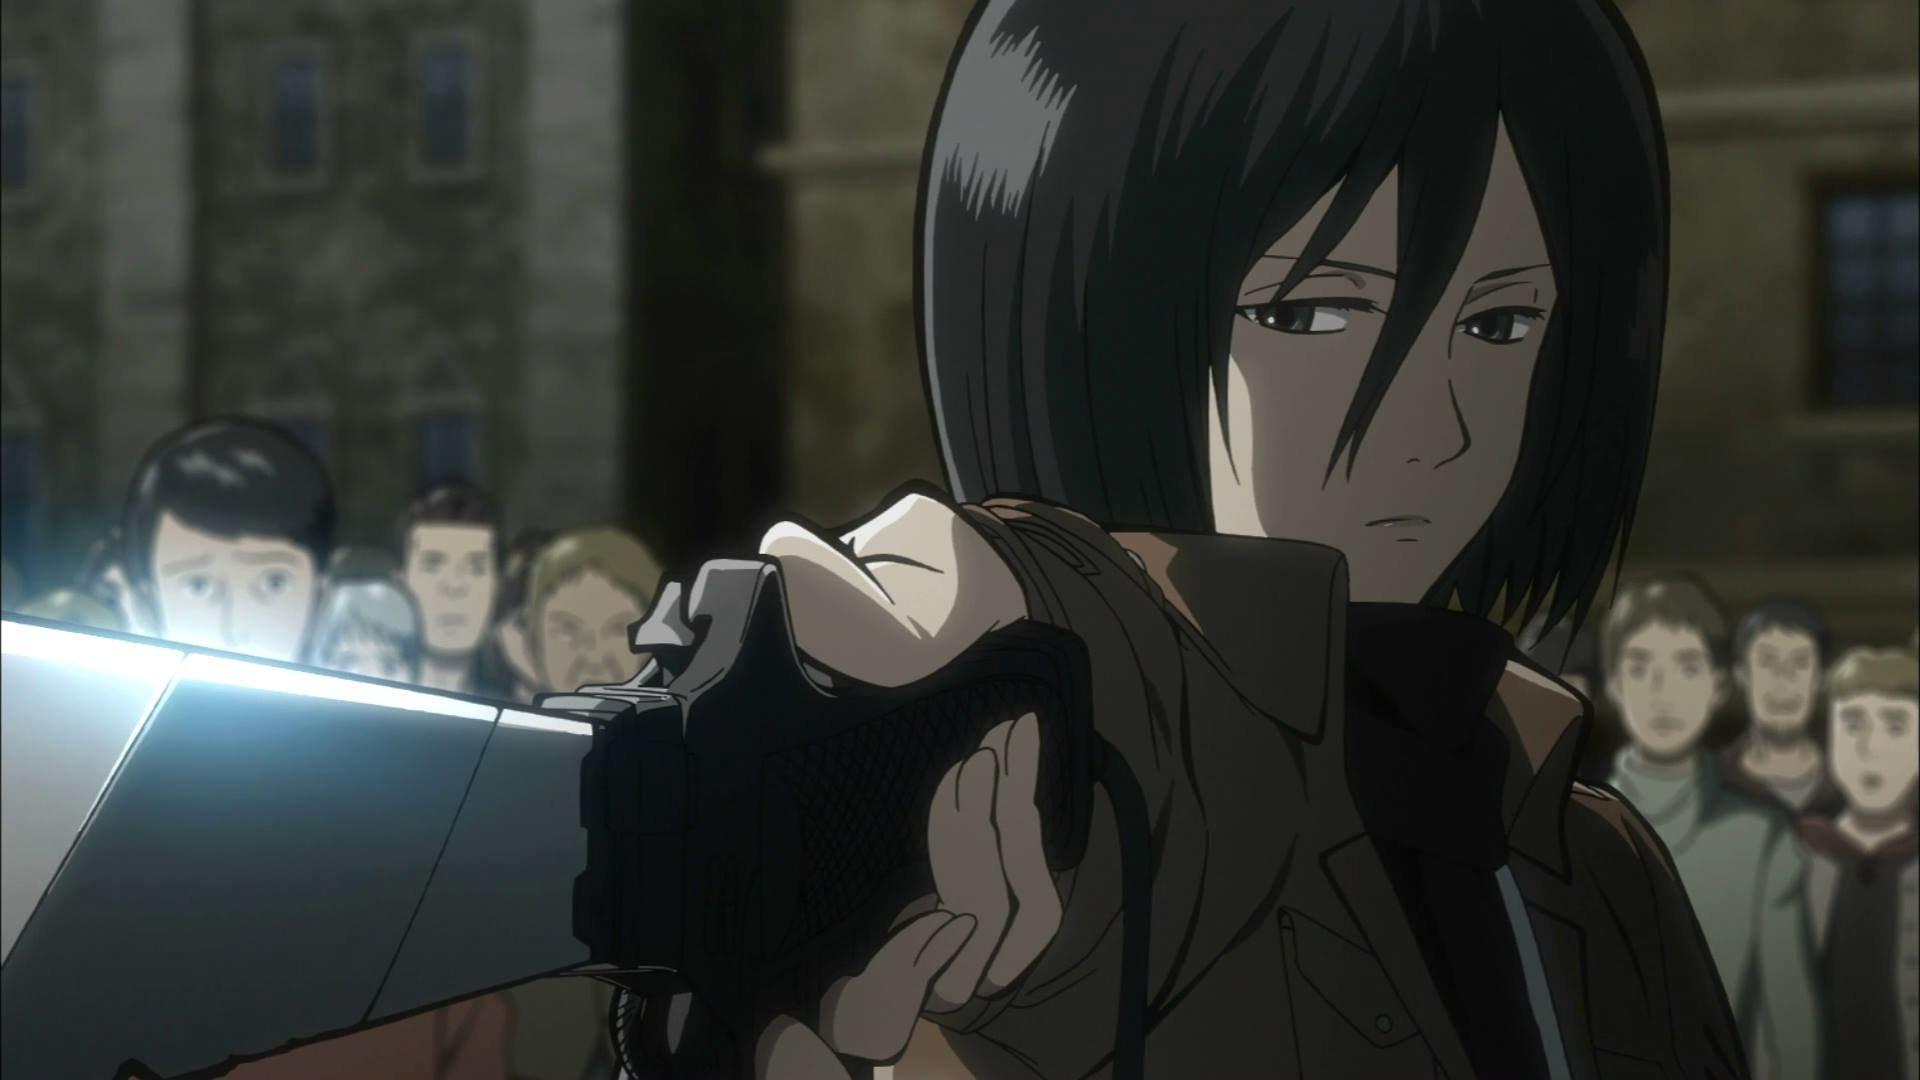 Shingeki No Kyojin Mikasa Ackerman Hd Wallpaper Background Image 1920x1080 Id 607719 Wallpaper Abyss